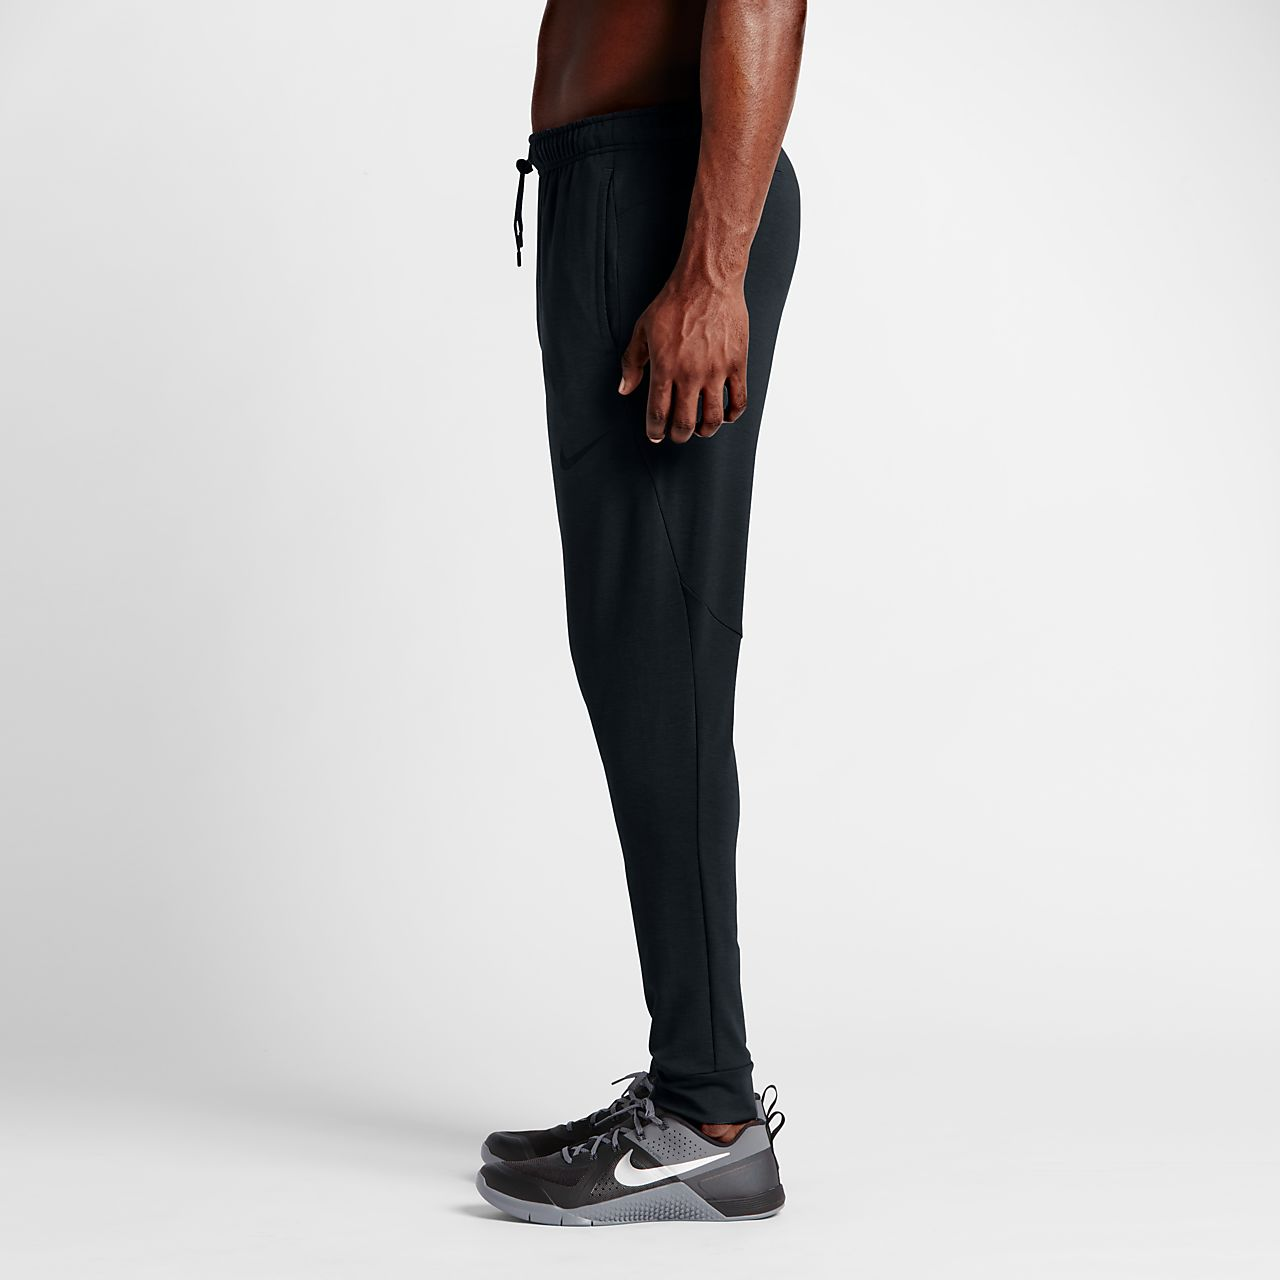 c9bde8948ab9ad Nike Dri-FIT Fleece-Trainingshose für Herren. Nike.com AT